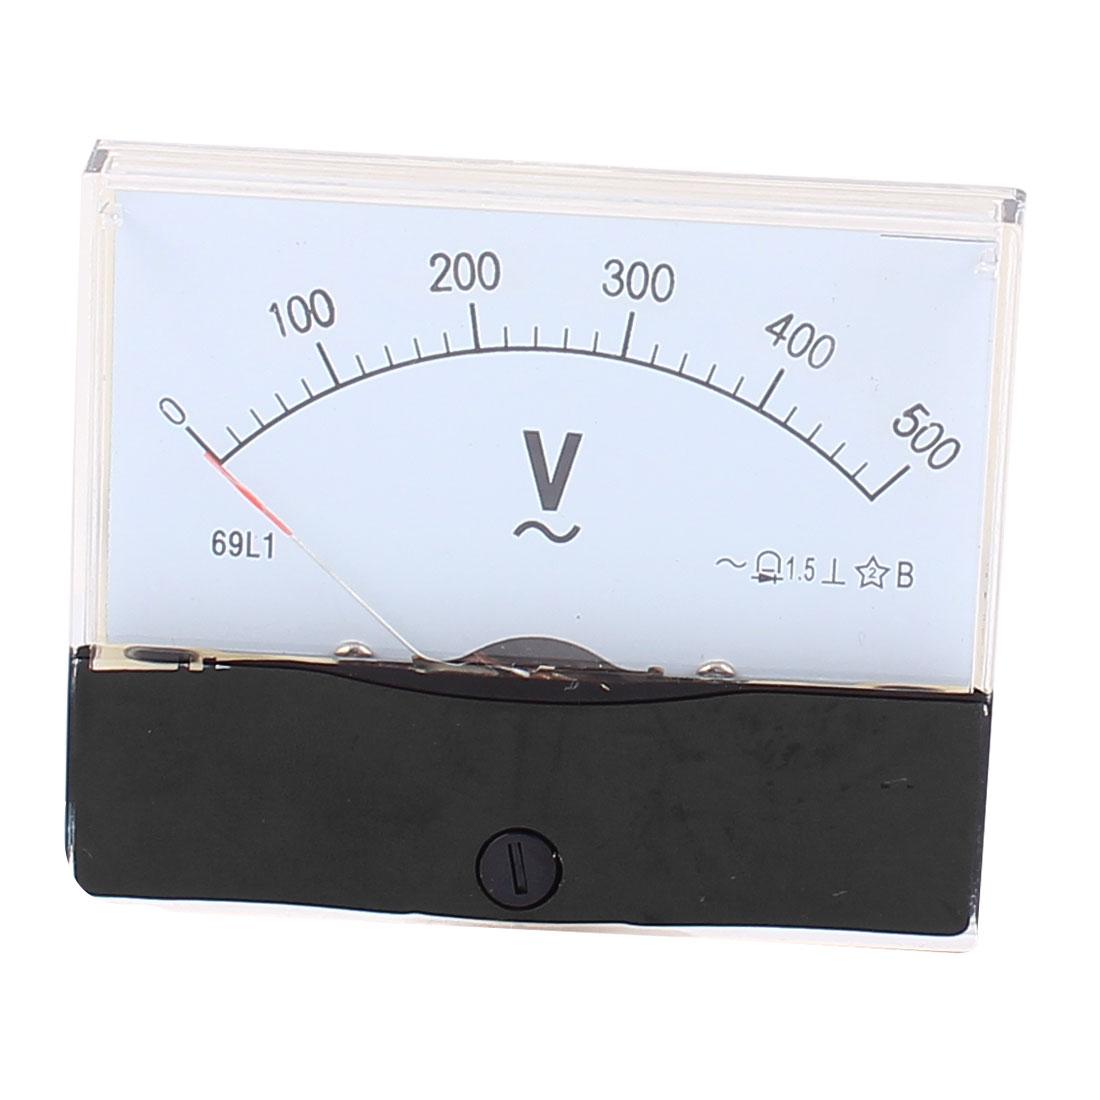 69L13 Pointer Needle AC 0-500V Volt Tester Panel Analog Voltmeter 80mm x 65mm